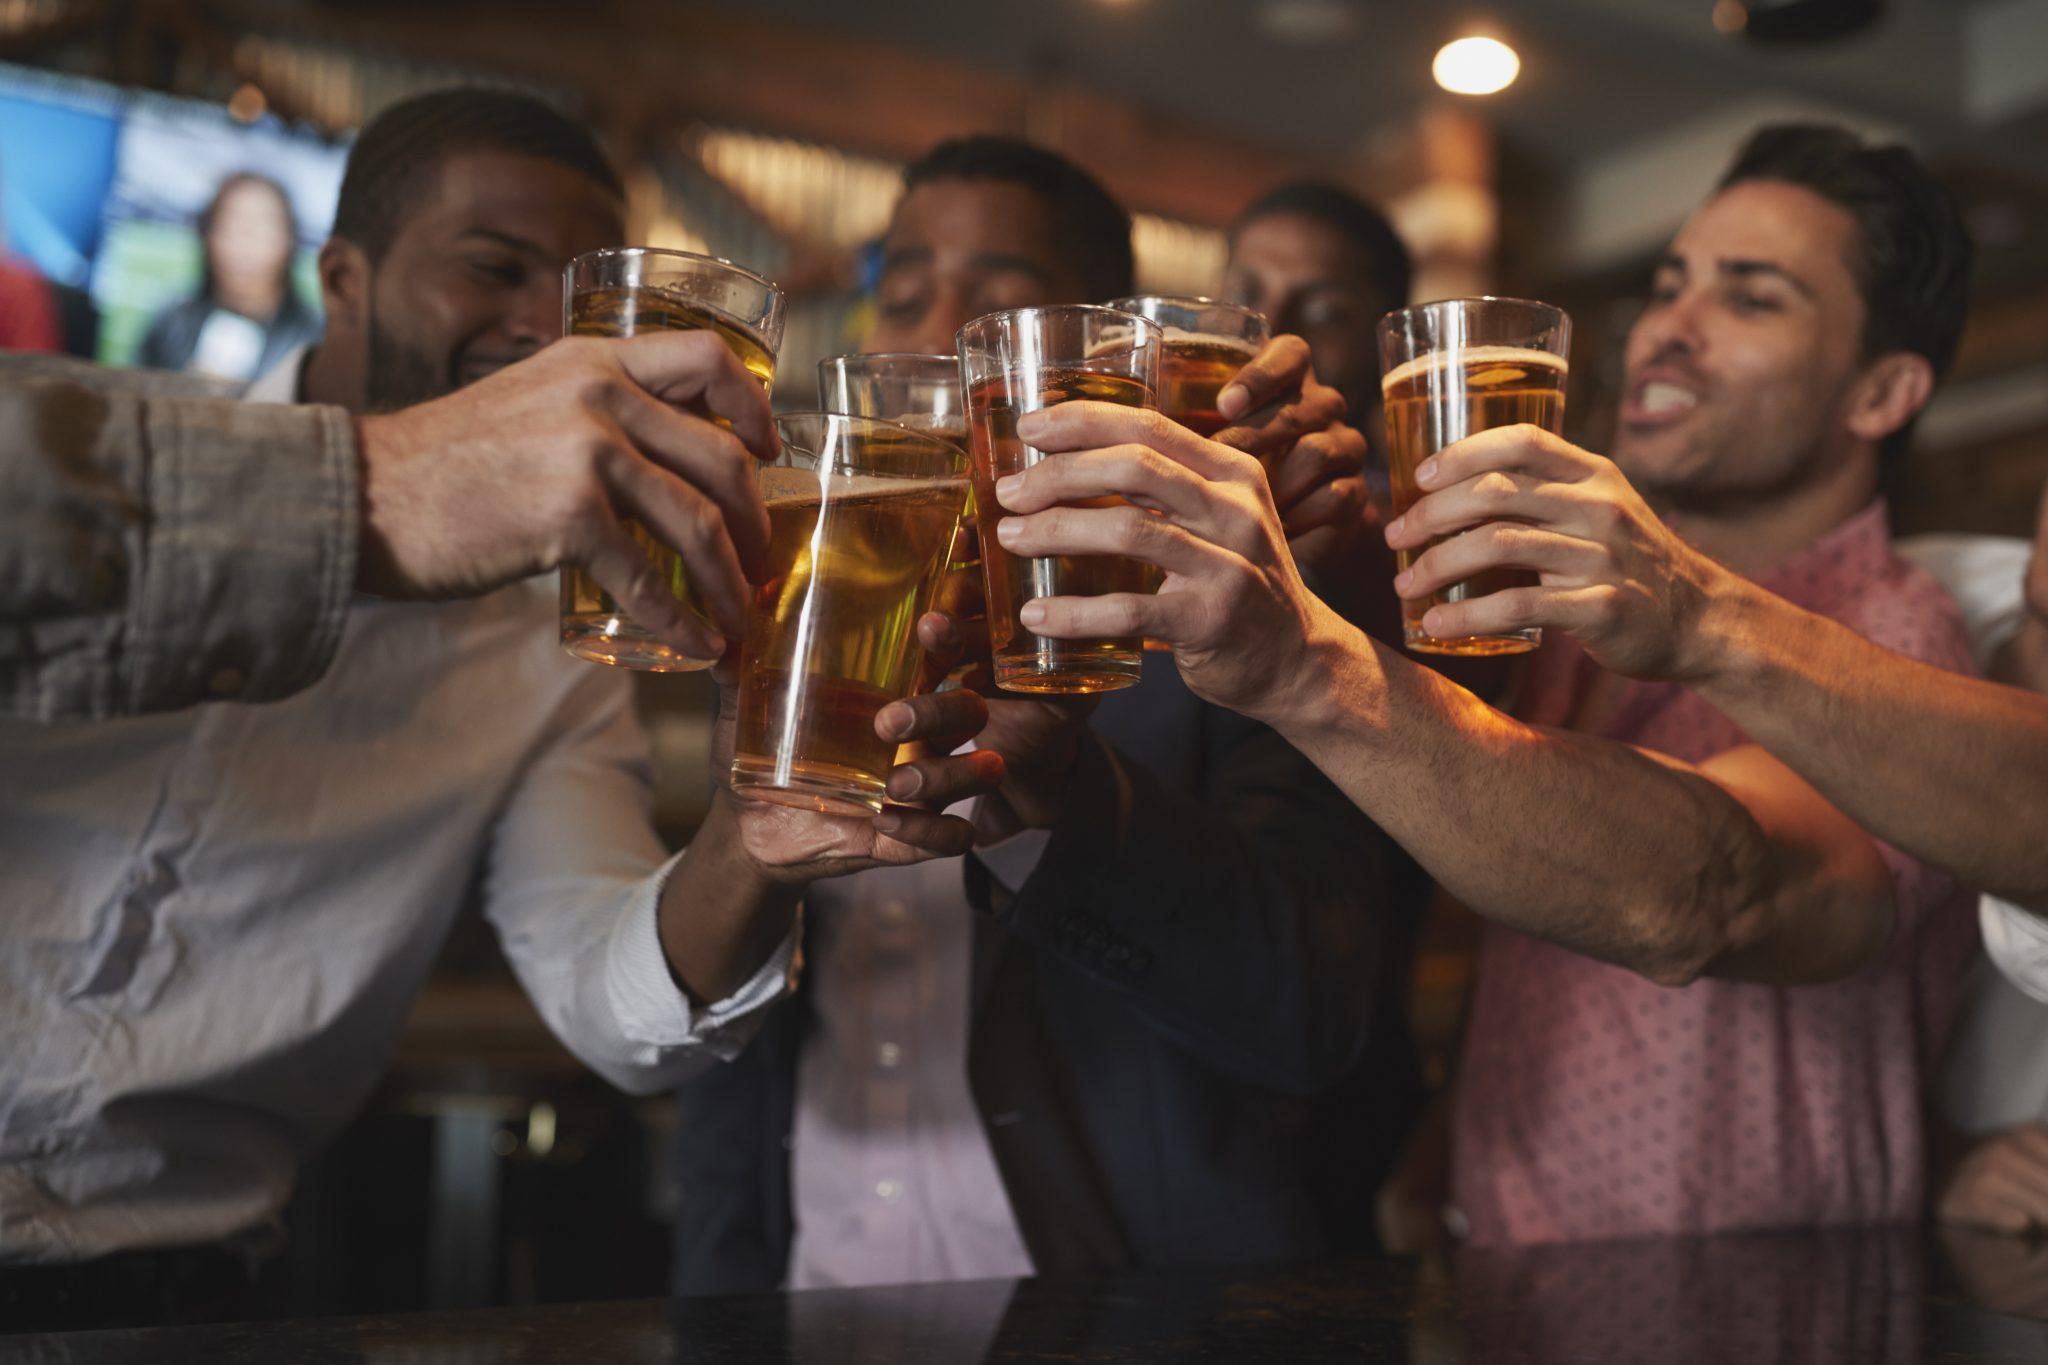 Wedding Duties: Best Man's Responsibility